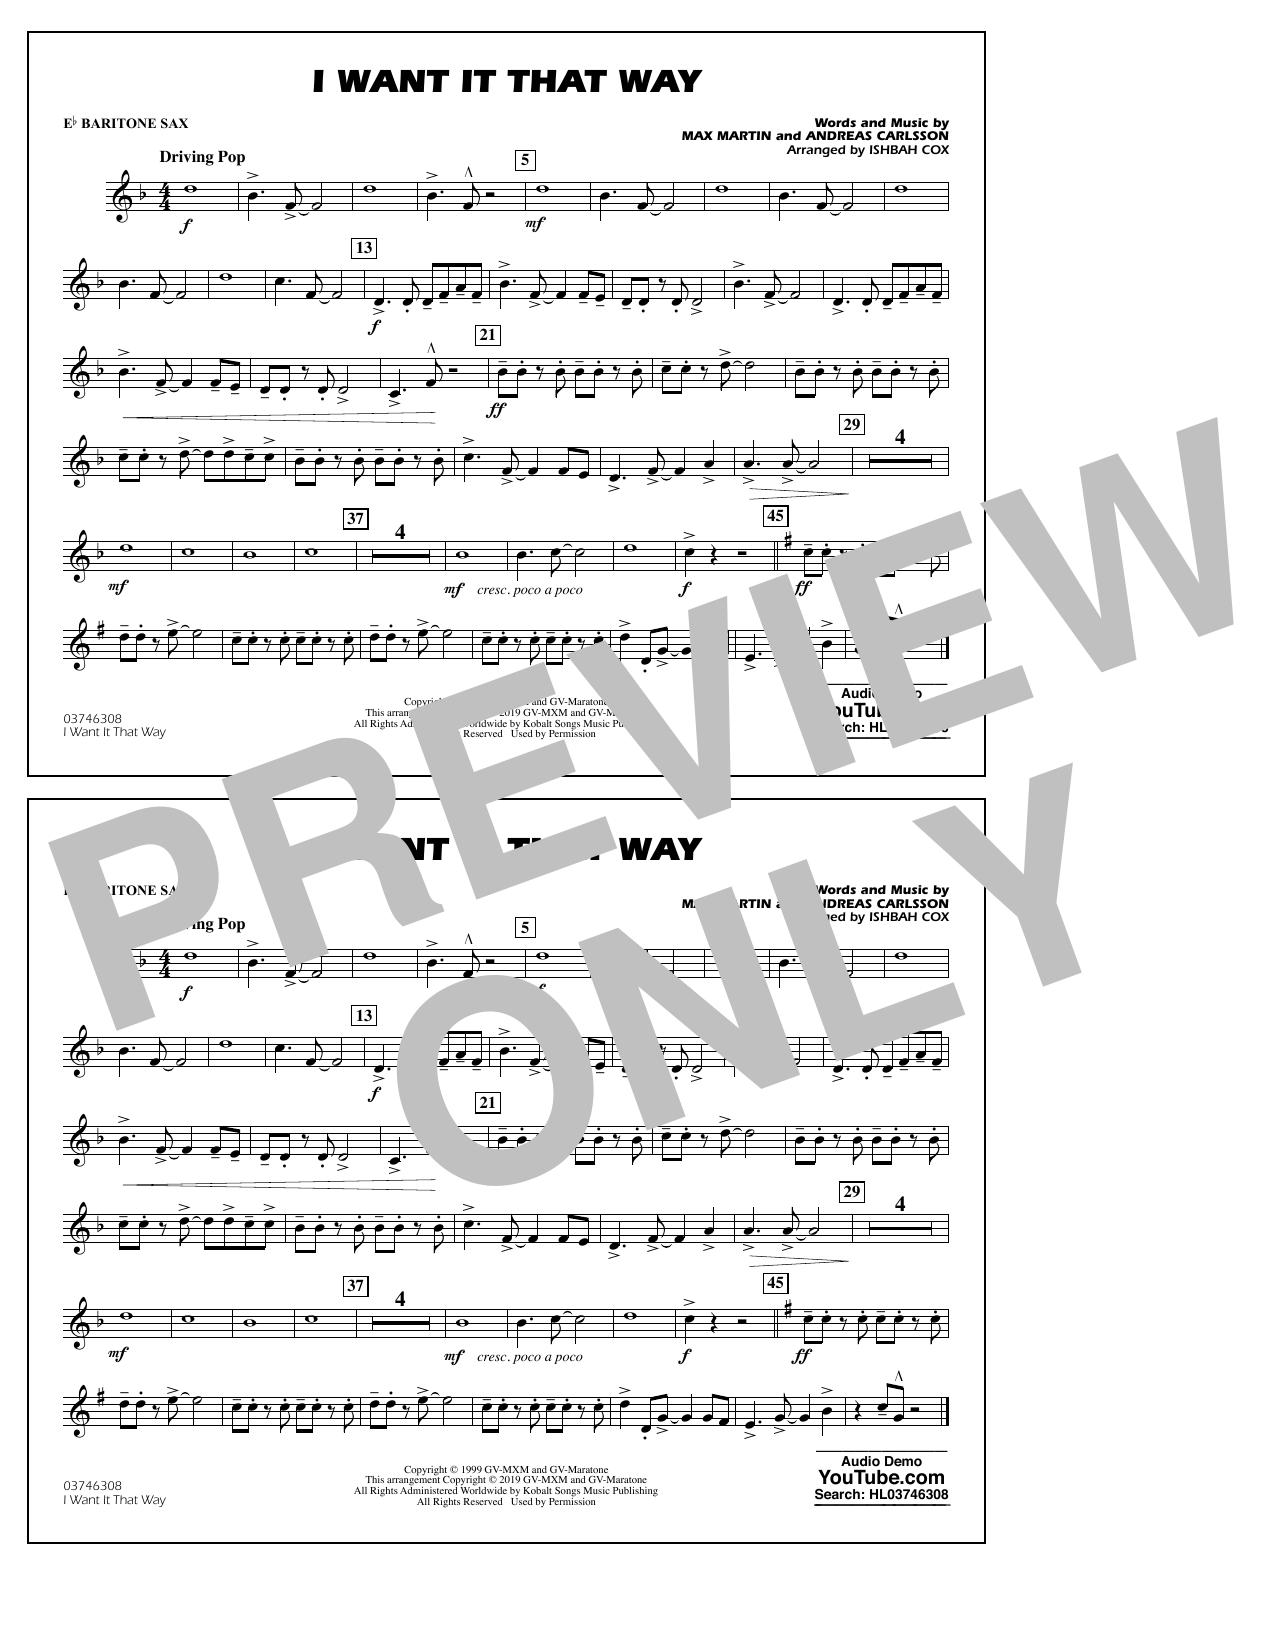 Backstreet Boys I Want It That Way (arr. Ishbah Cox) - Eb Baritone Sax sheet music notes and chords